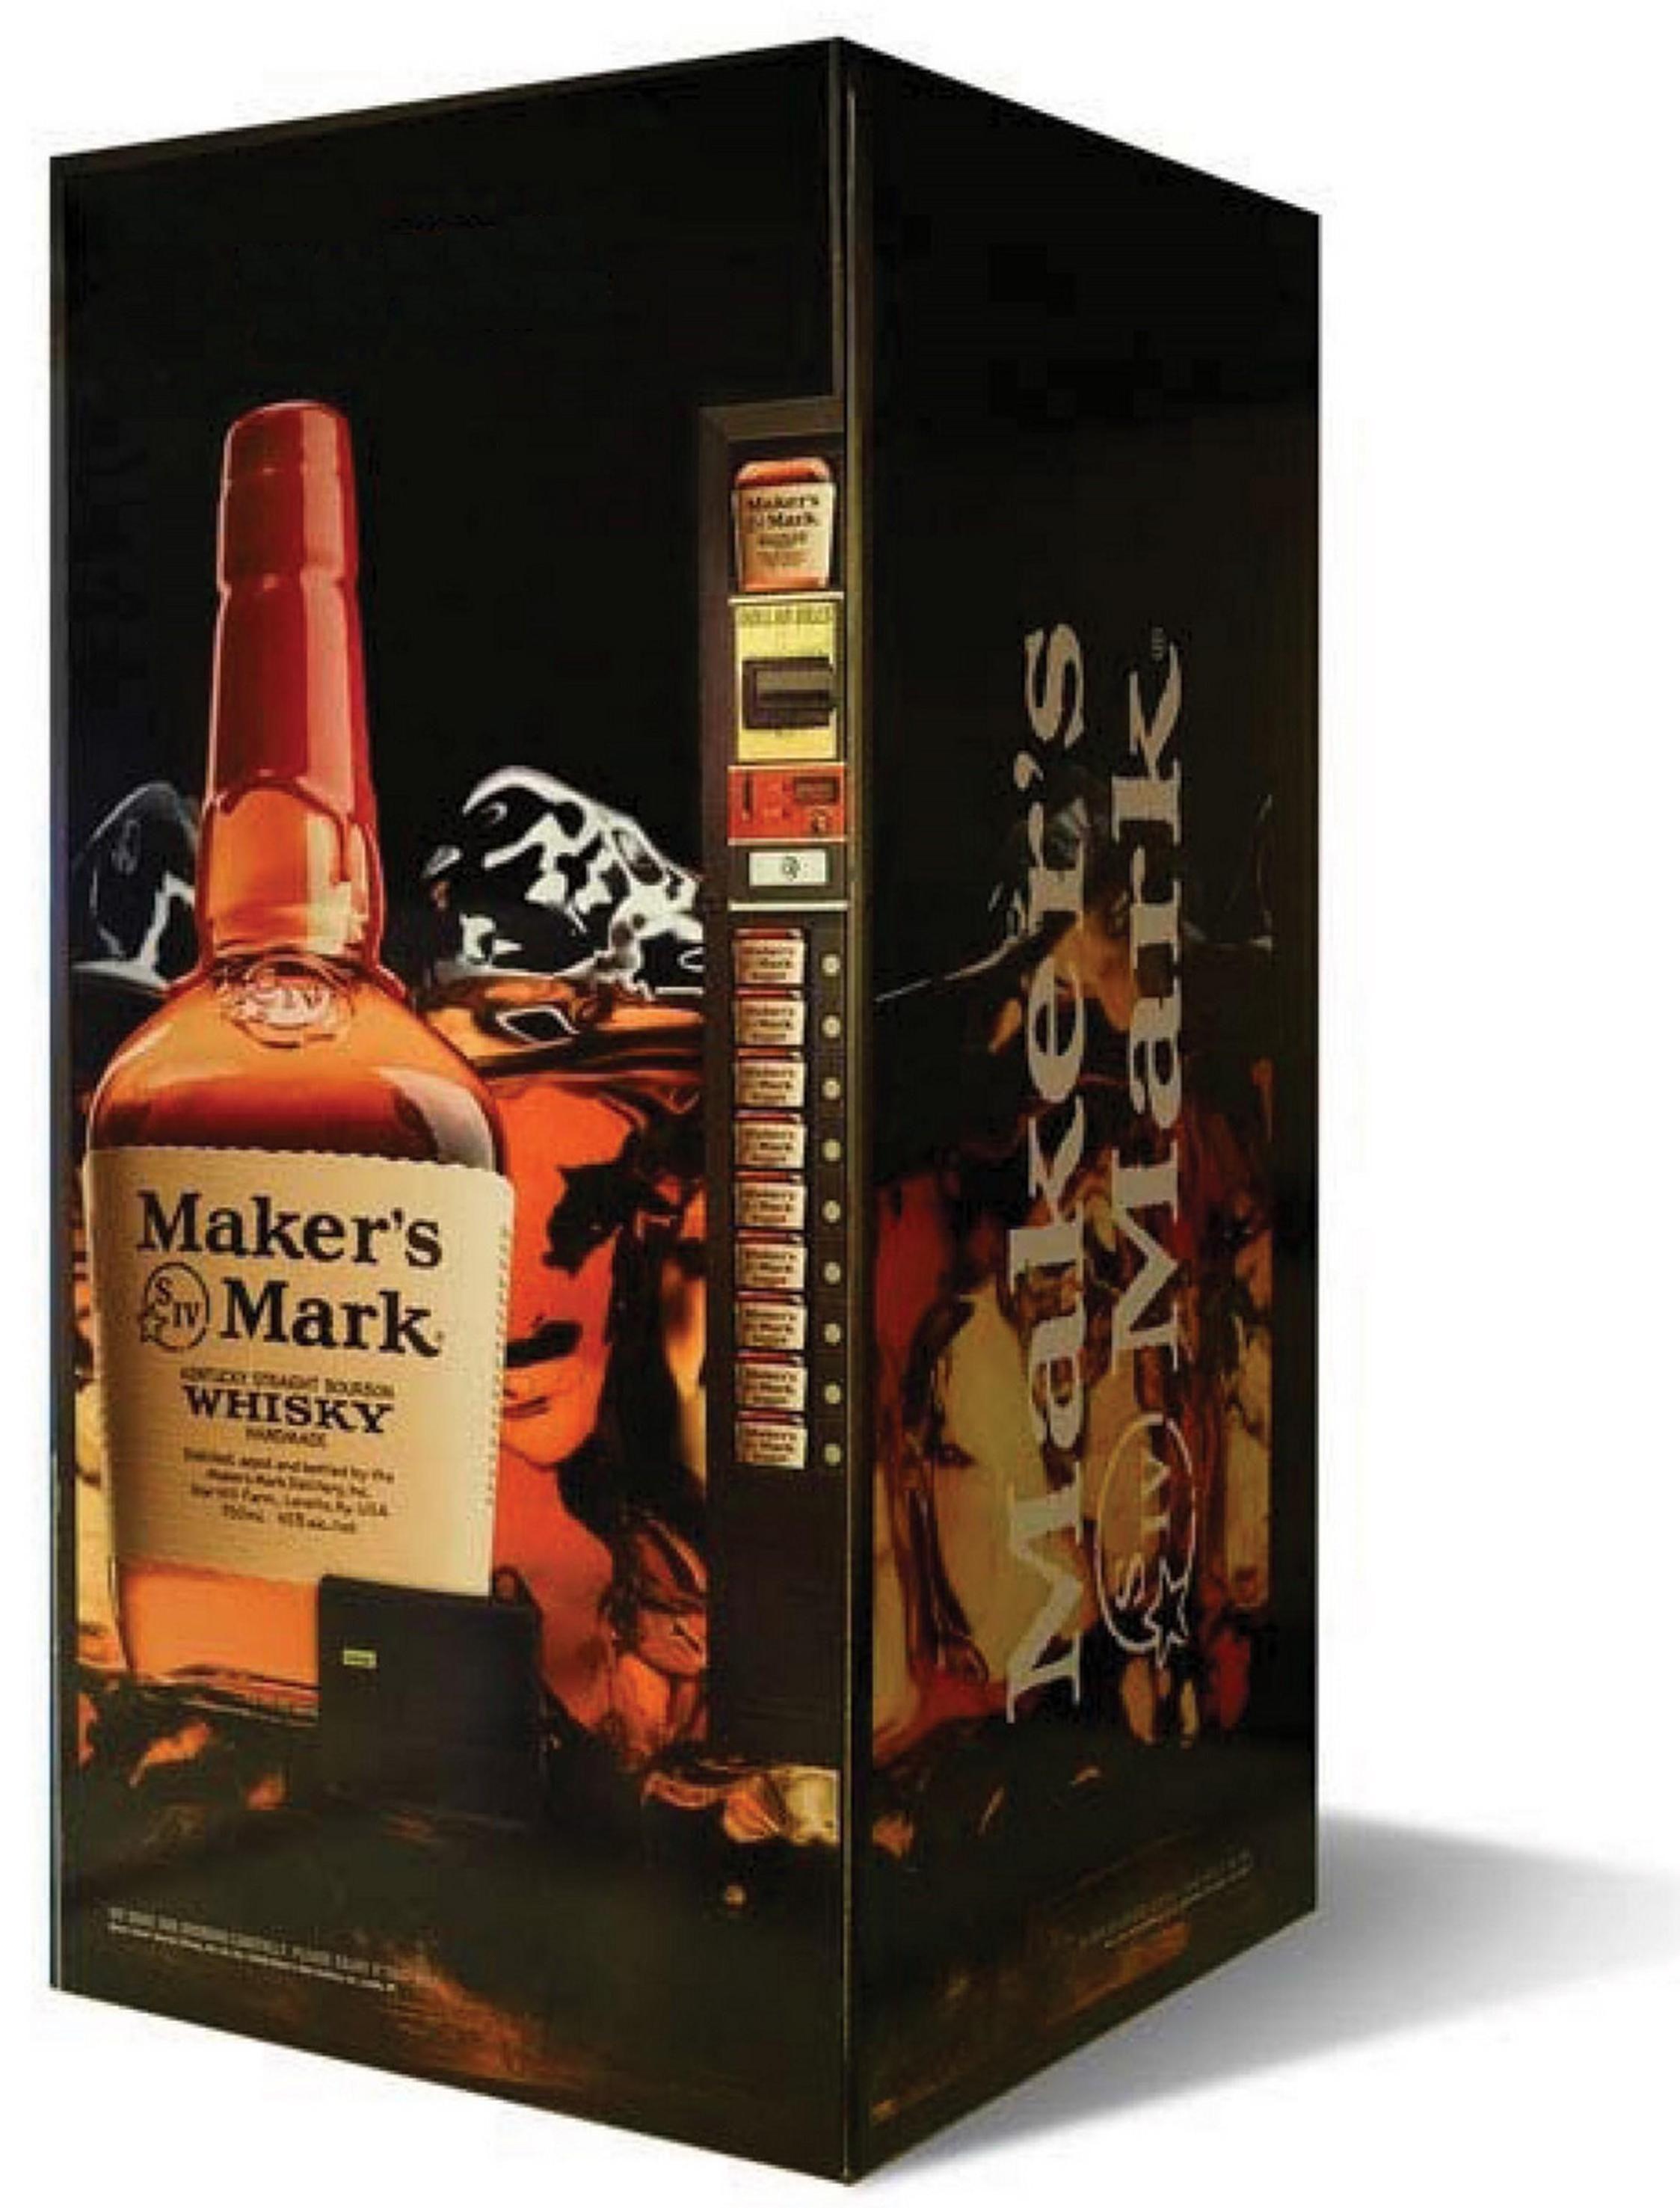 maker s mark whisky vending machine complete with bartender inside